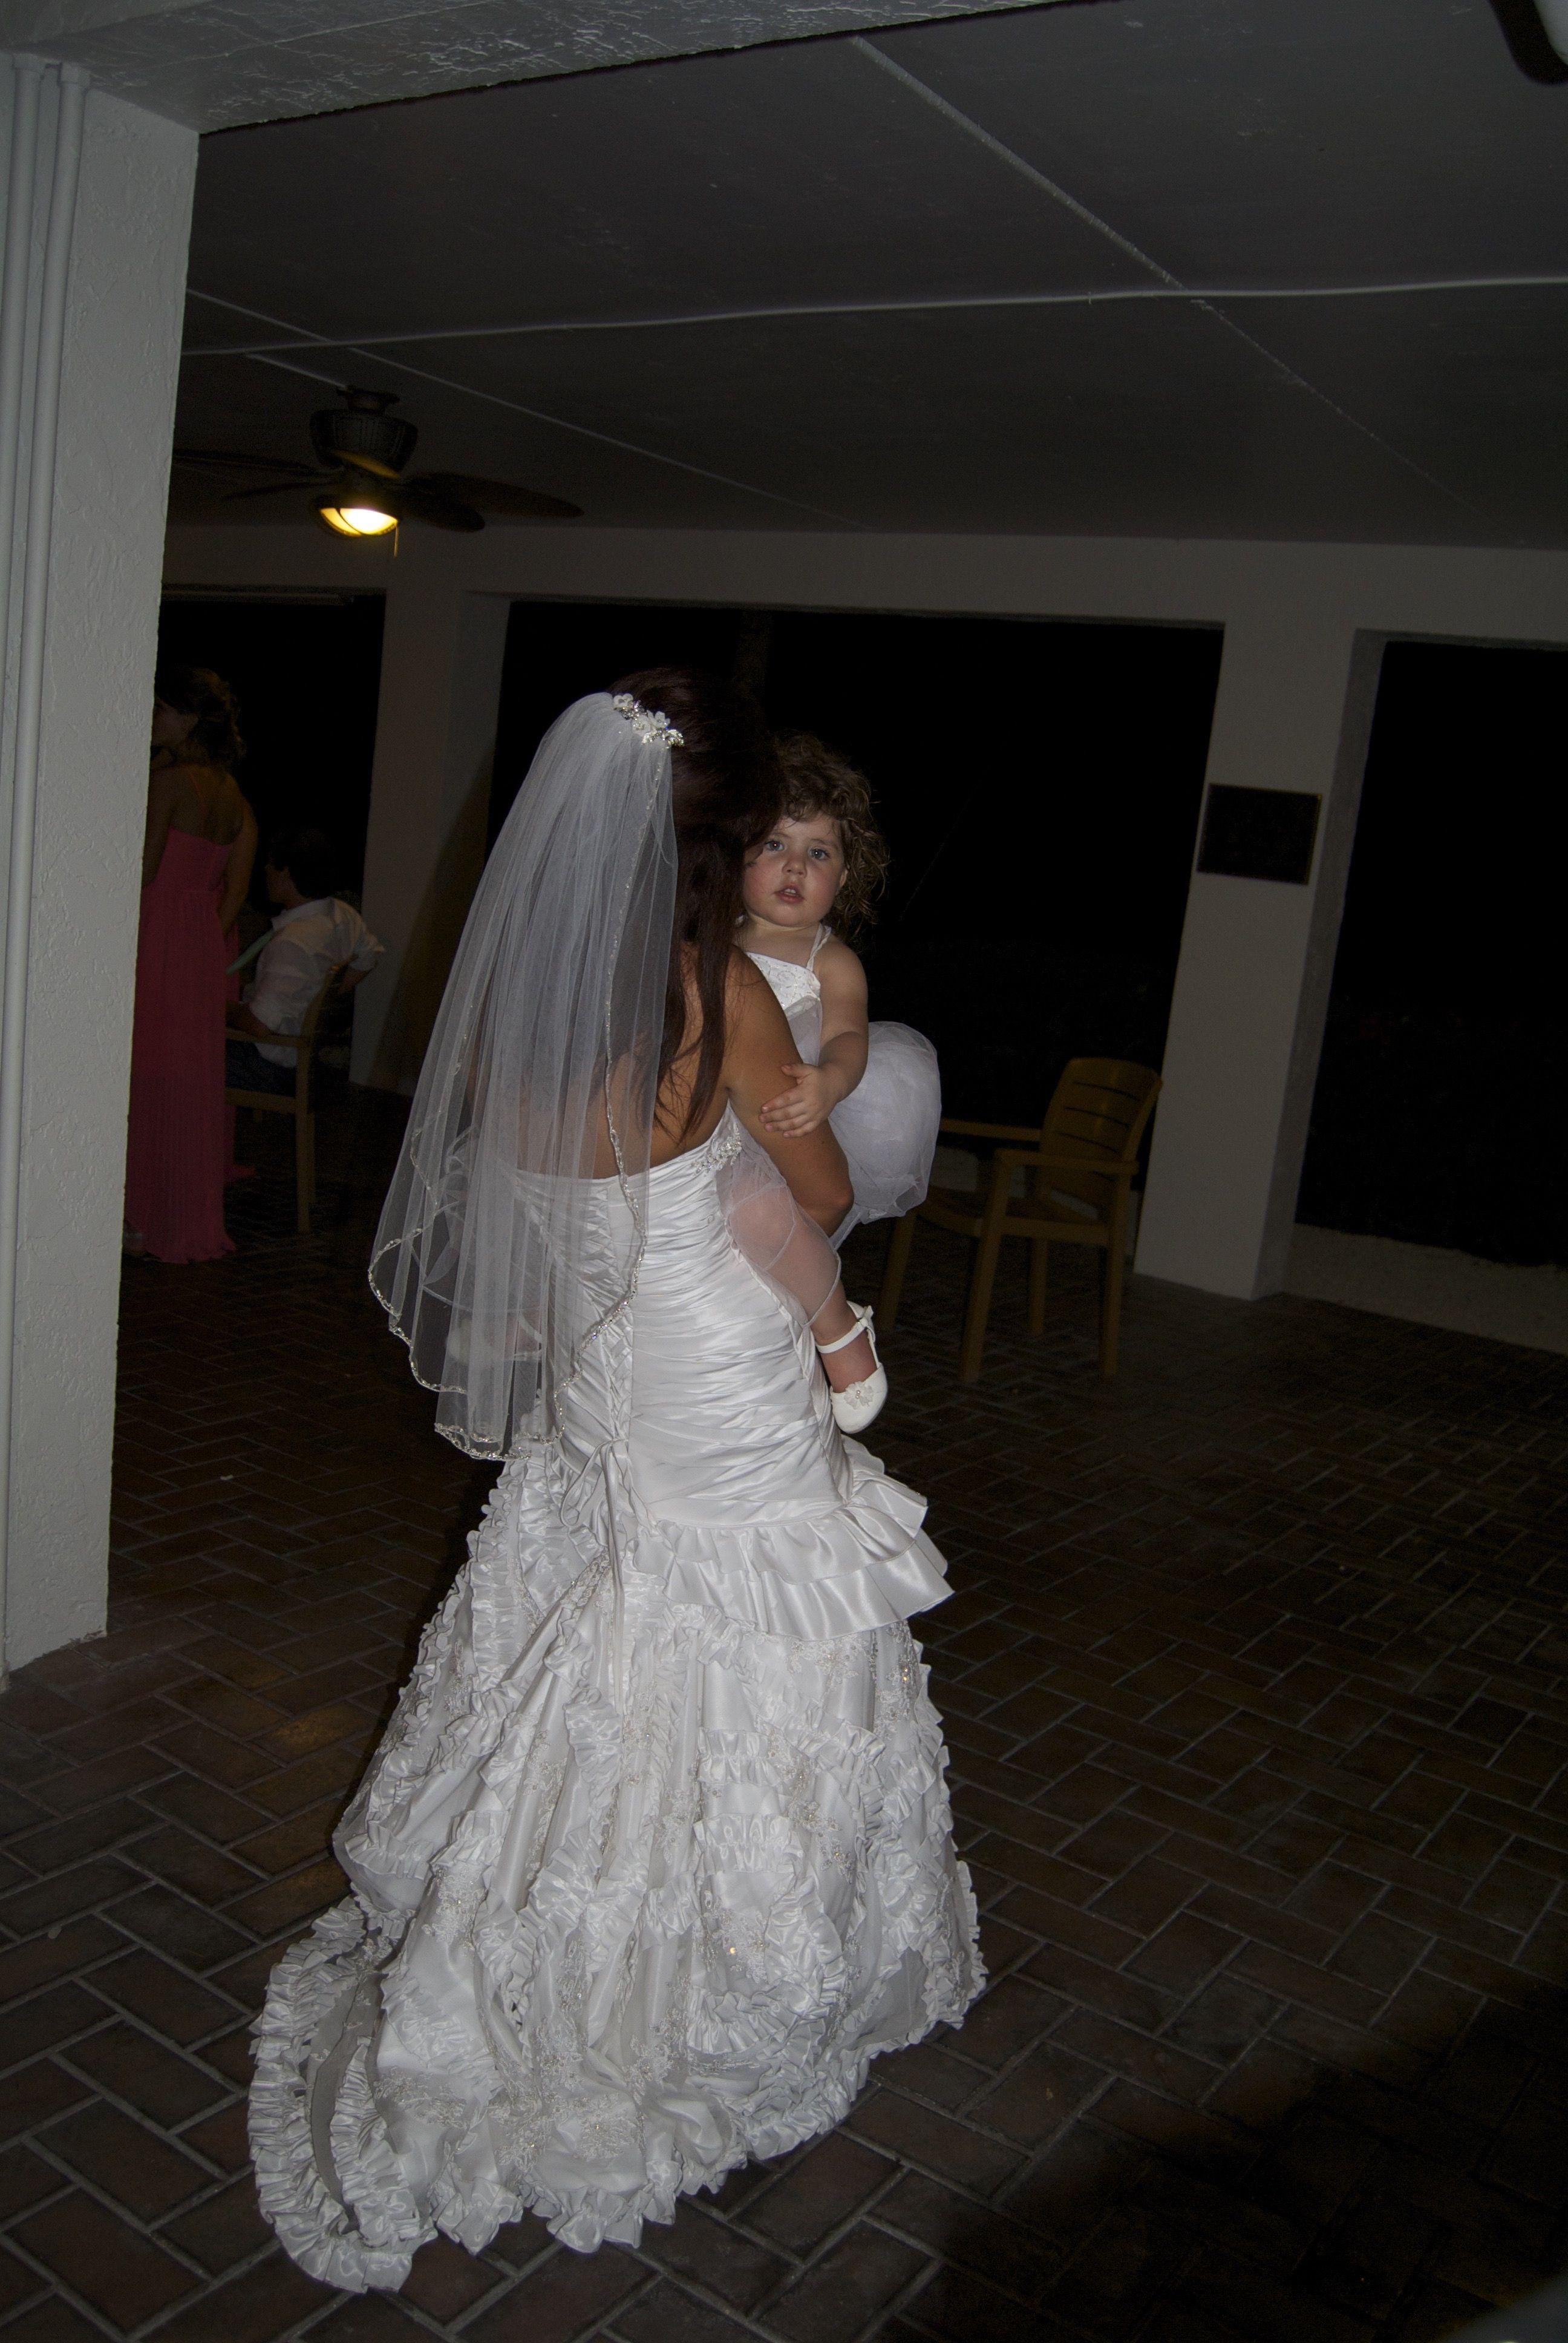 Bride holding the adorable flower girl